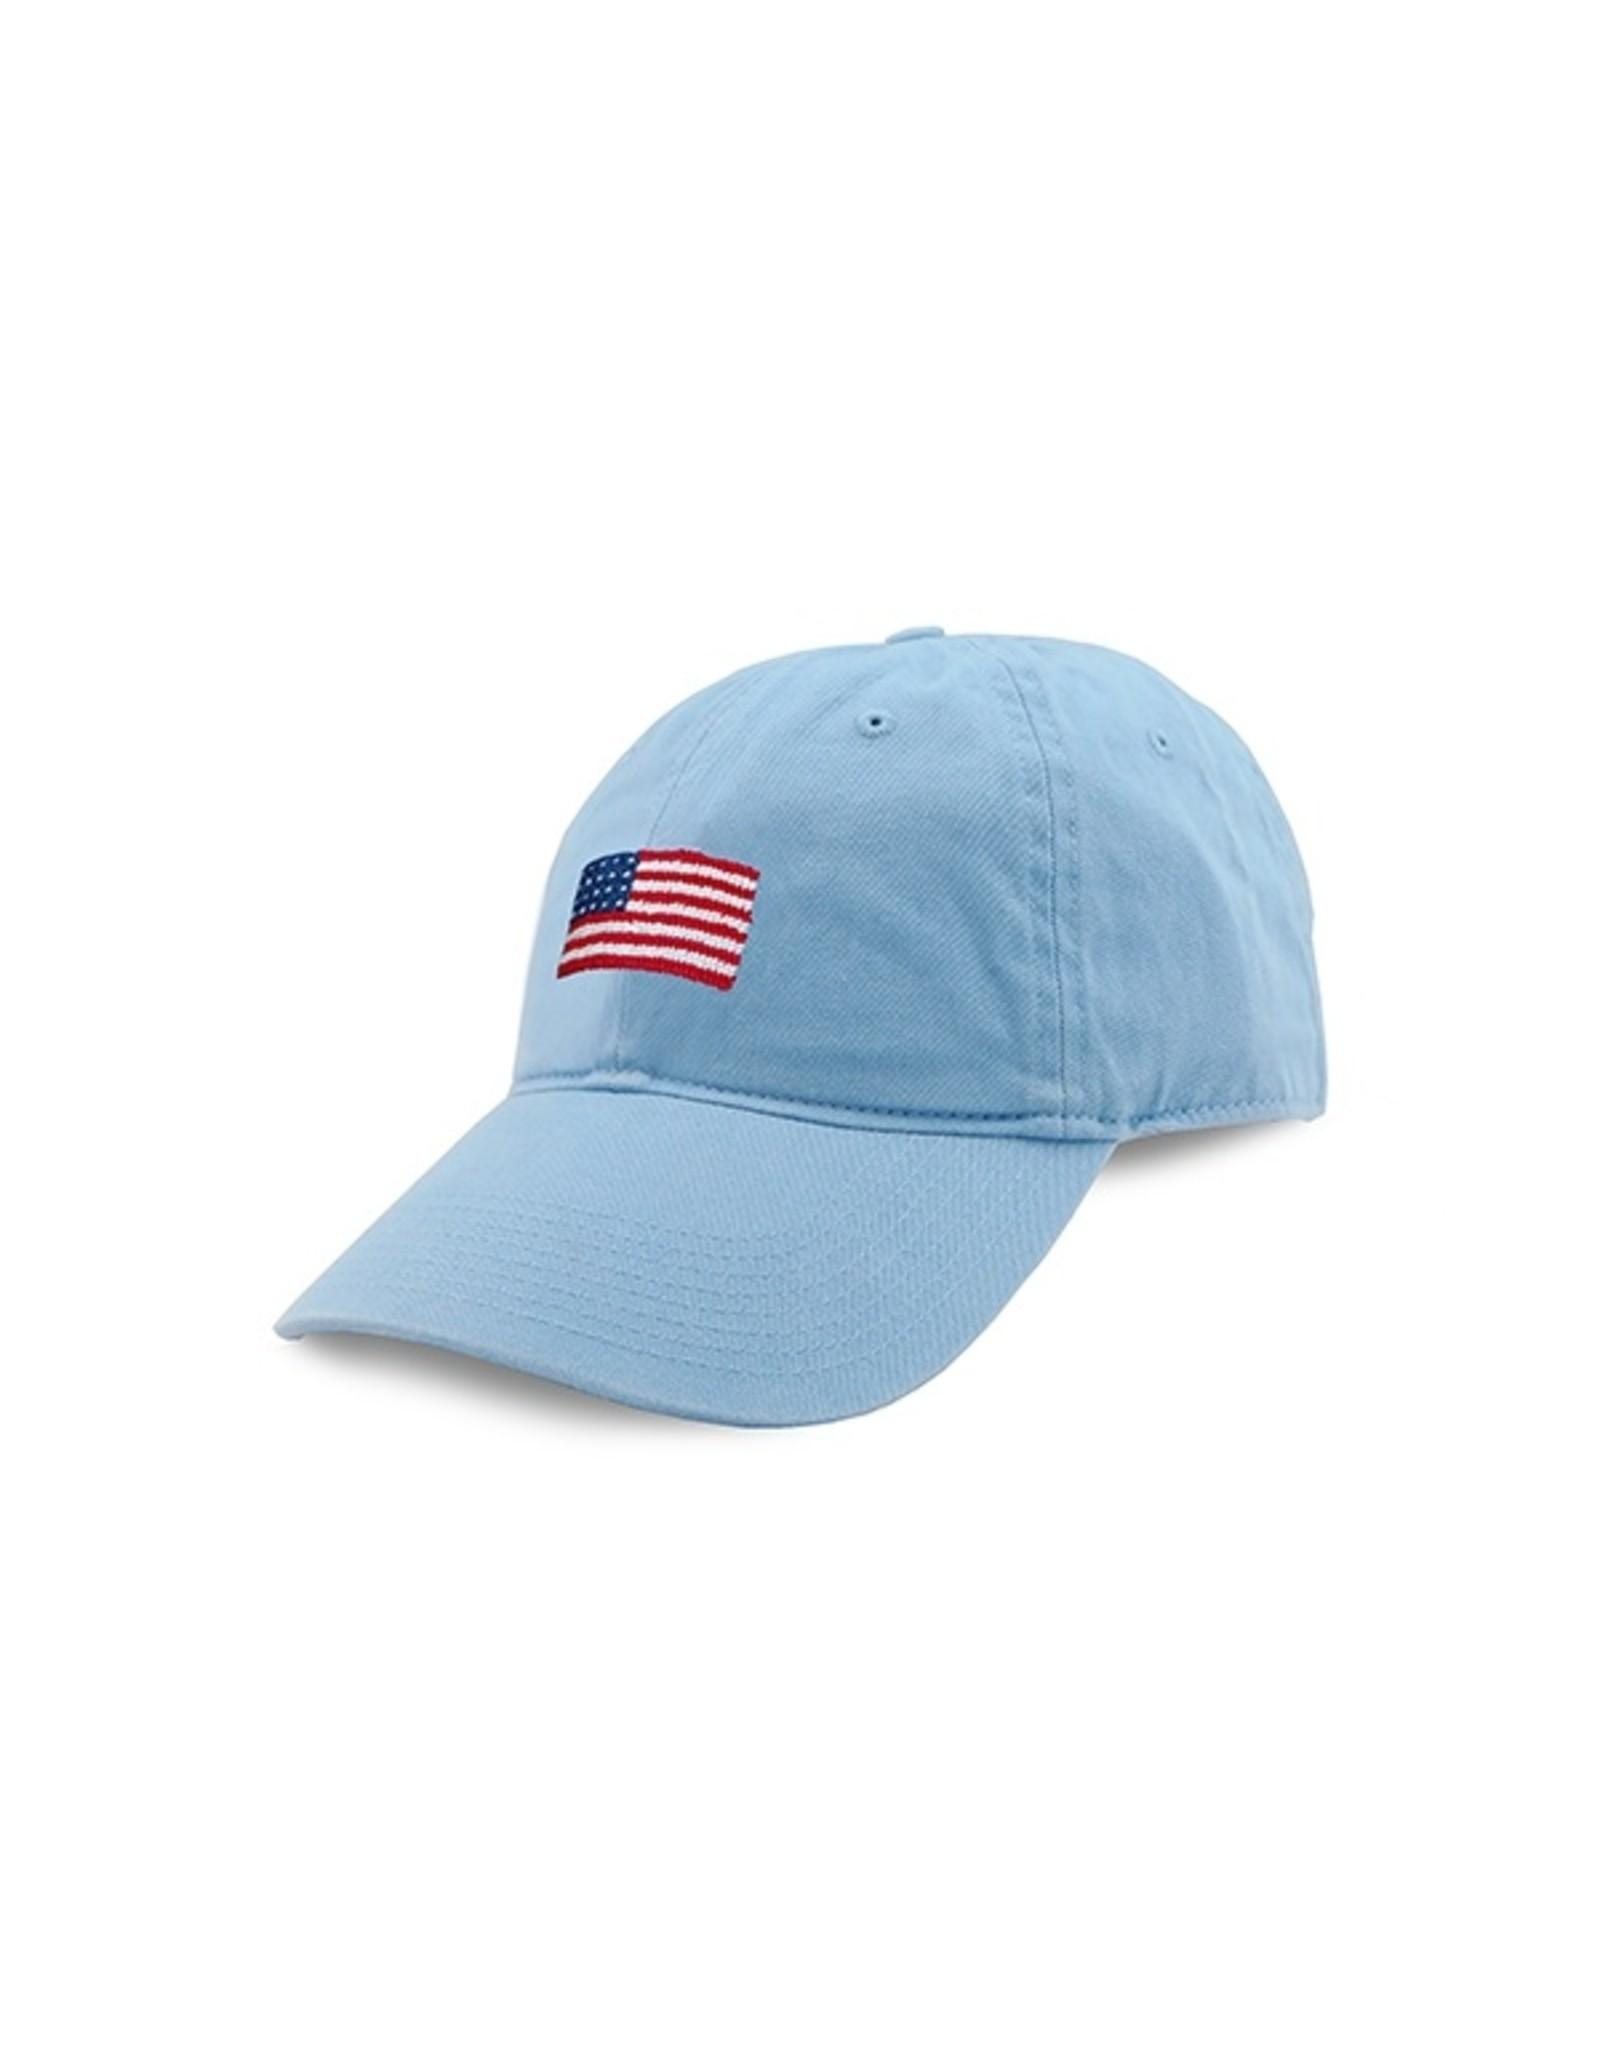 Smathers & Branson S&B Needlepoint Ball Hat, American Flag (Sky Blue)